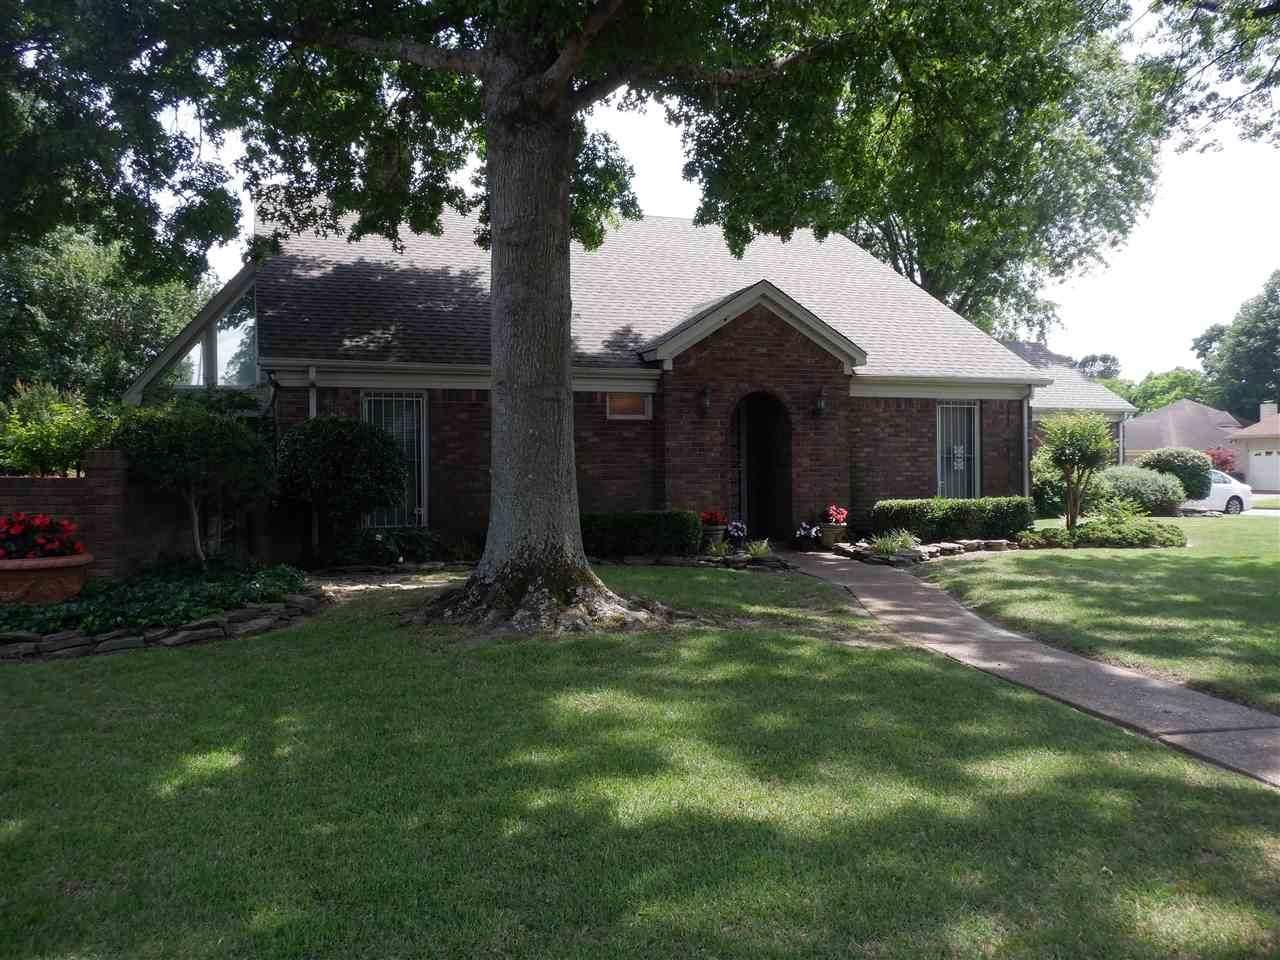 7065 Belsfield Rd - Photo 1